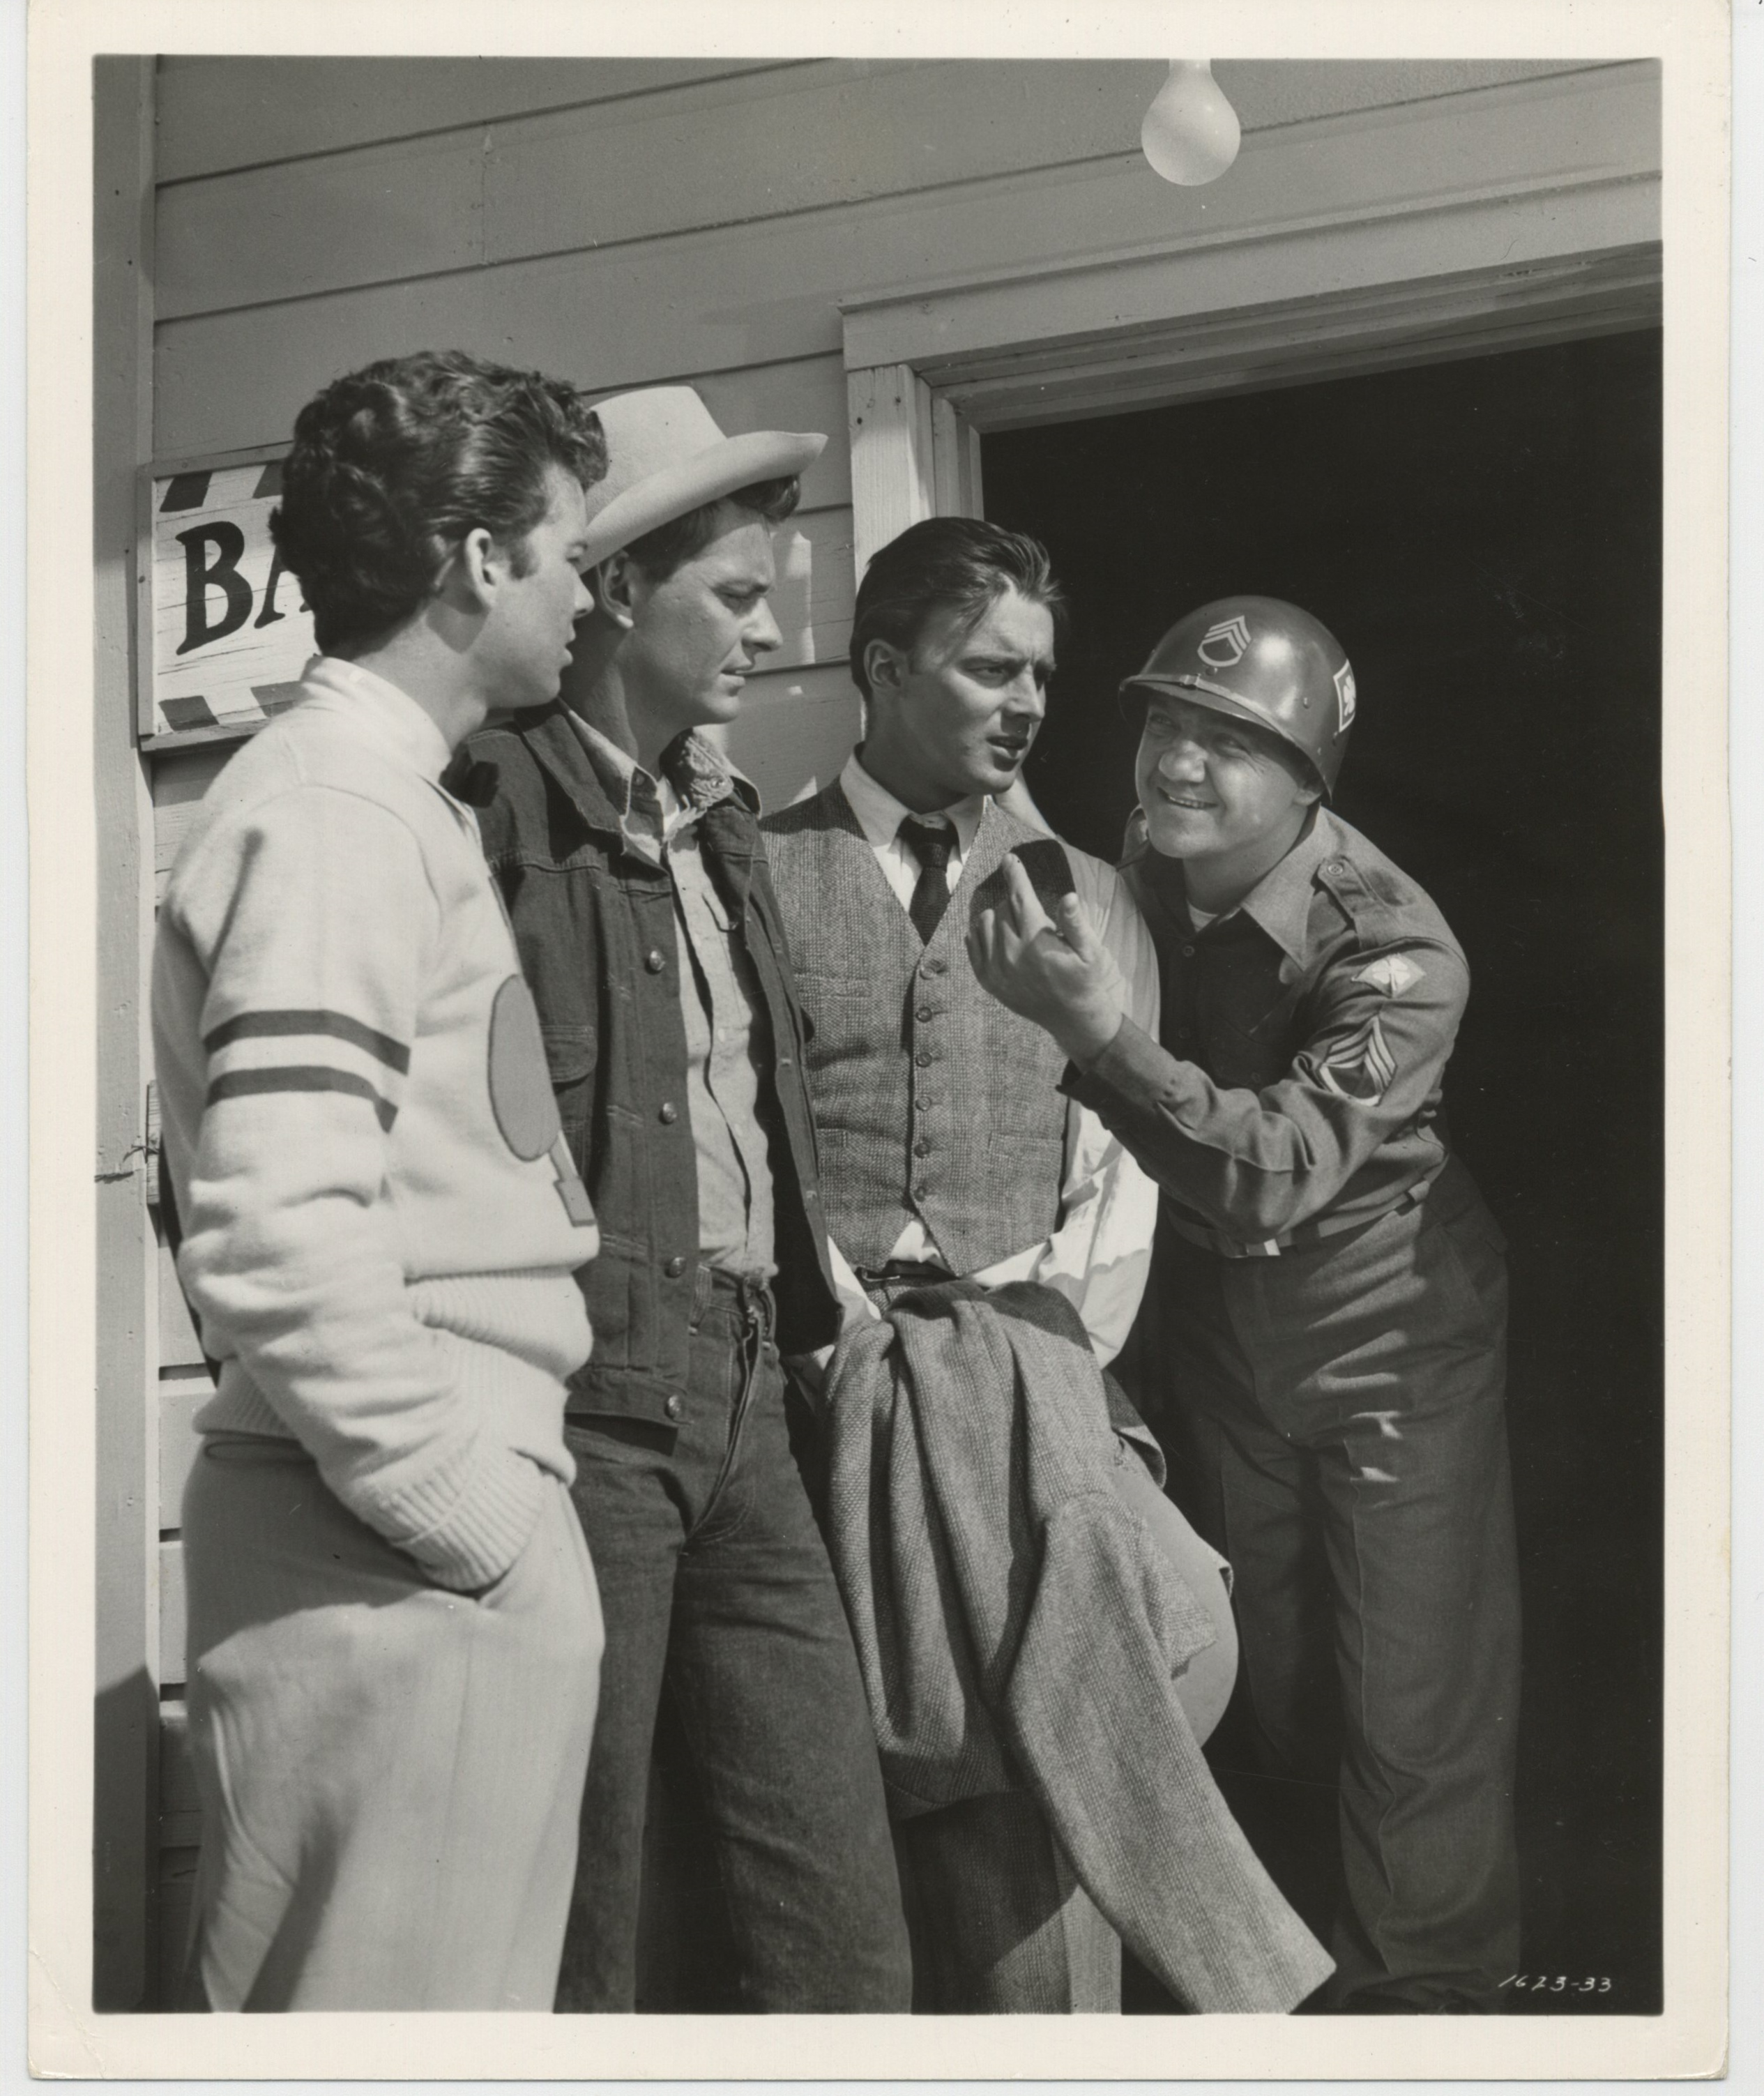 Karl Malden, Carleton Carpenter, Jerome Courtland, and Russ Tamblyn in Take the High Ground! (1953)